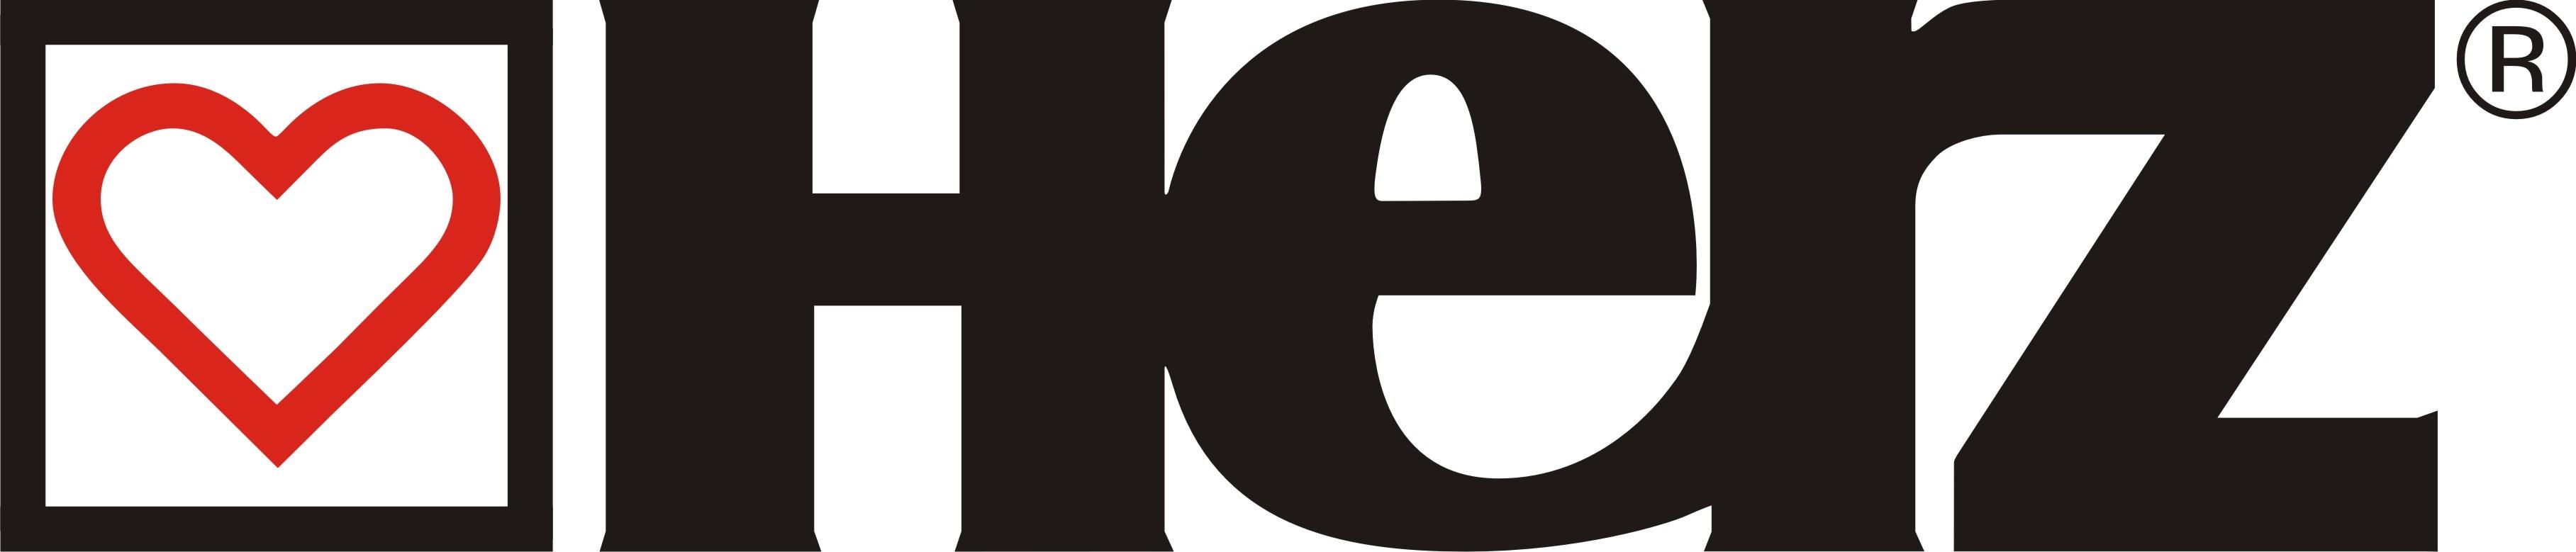 Herz logo24bit